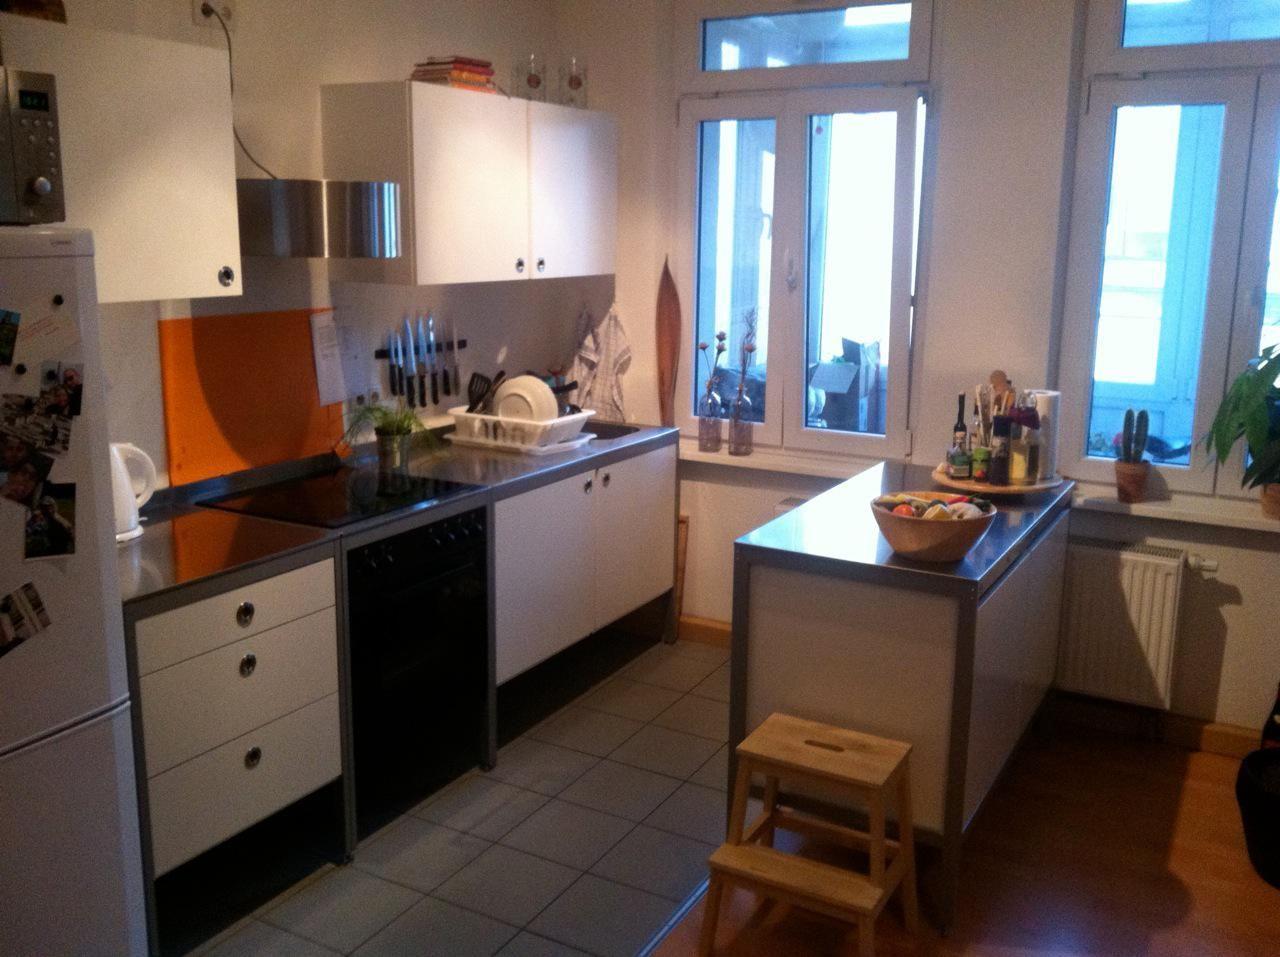 Nice Ikea Udden Küche Fotos >> Ikea Udden Kuche Maxycribs Com. 10 ...